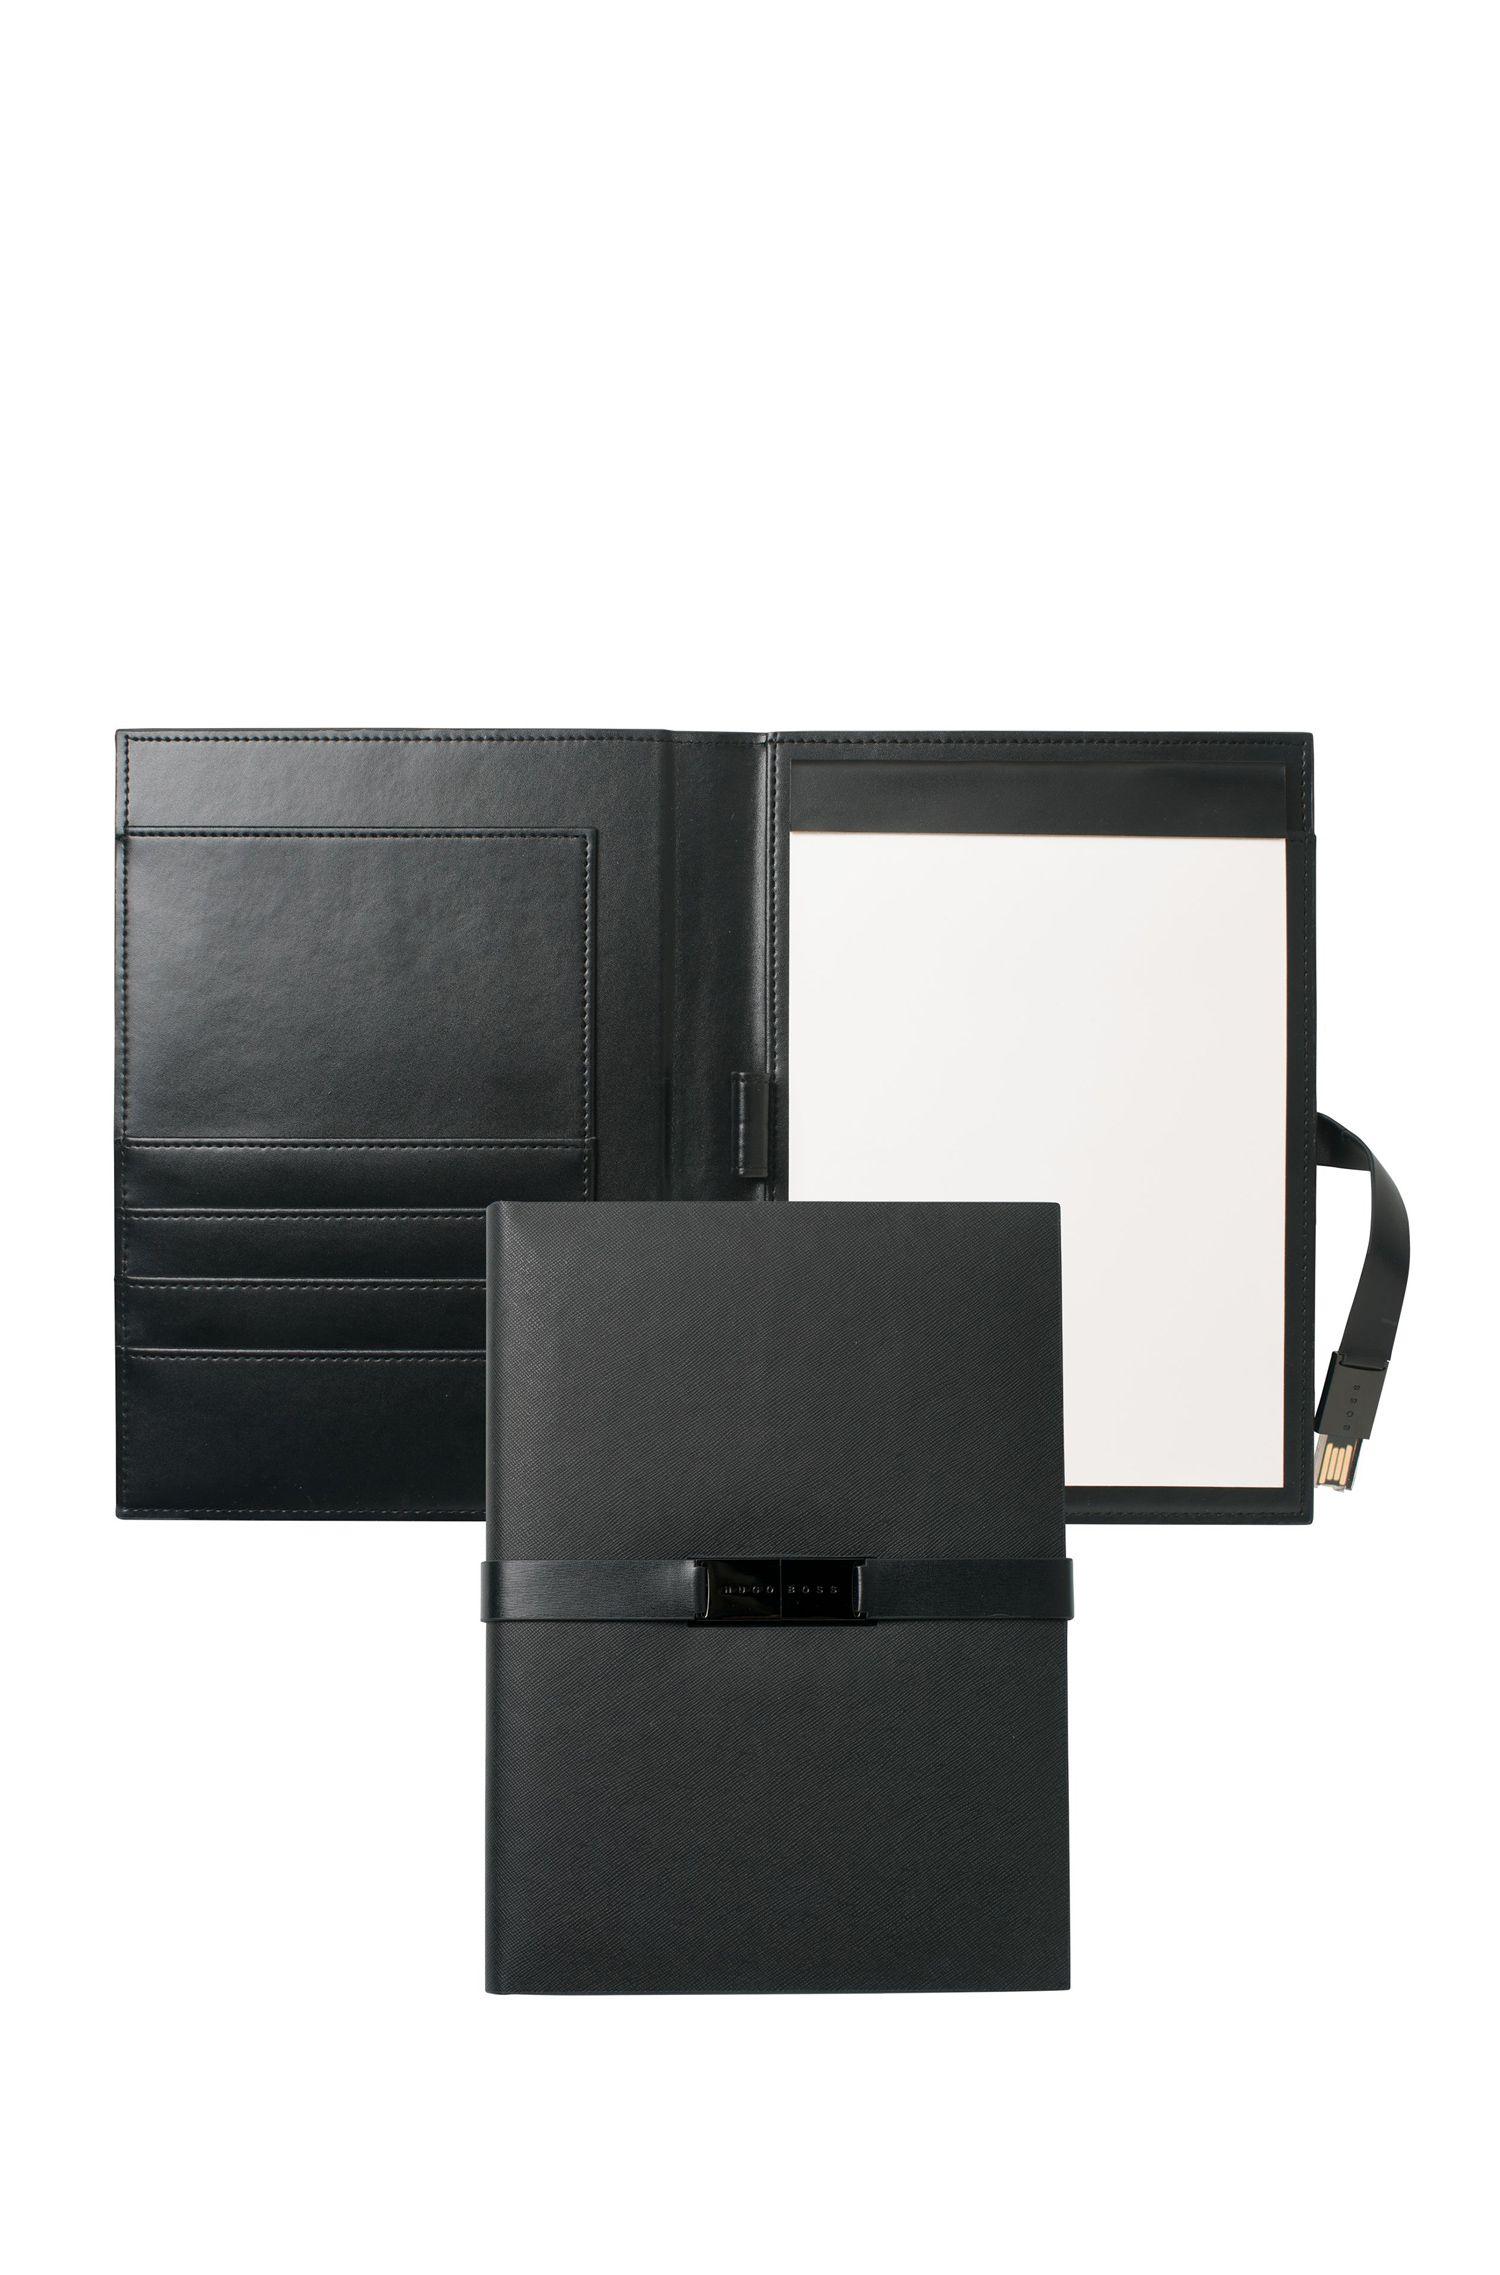 'Folder With USB Binder' | Leather Folder With Pad, USB Stick